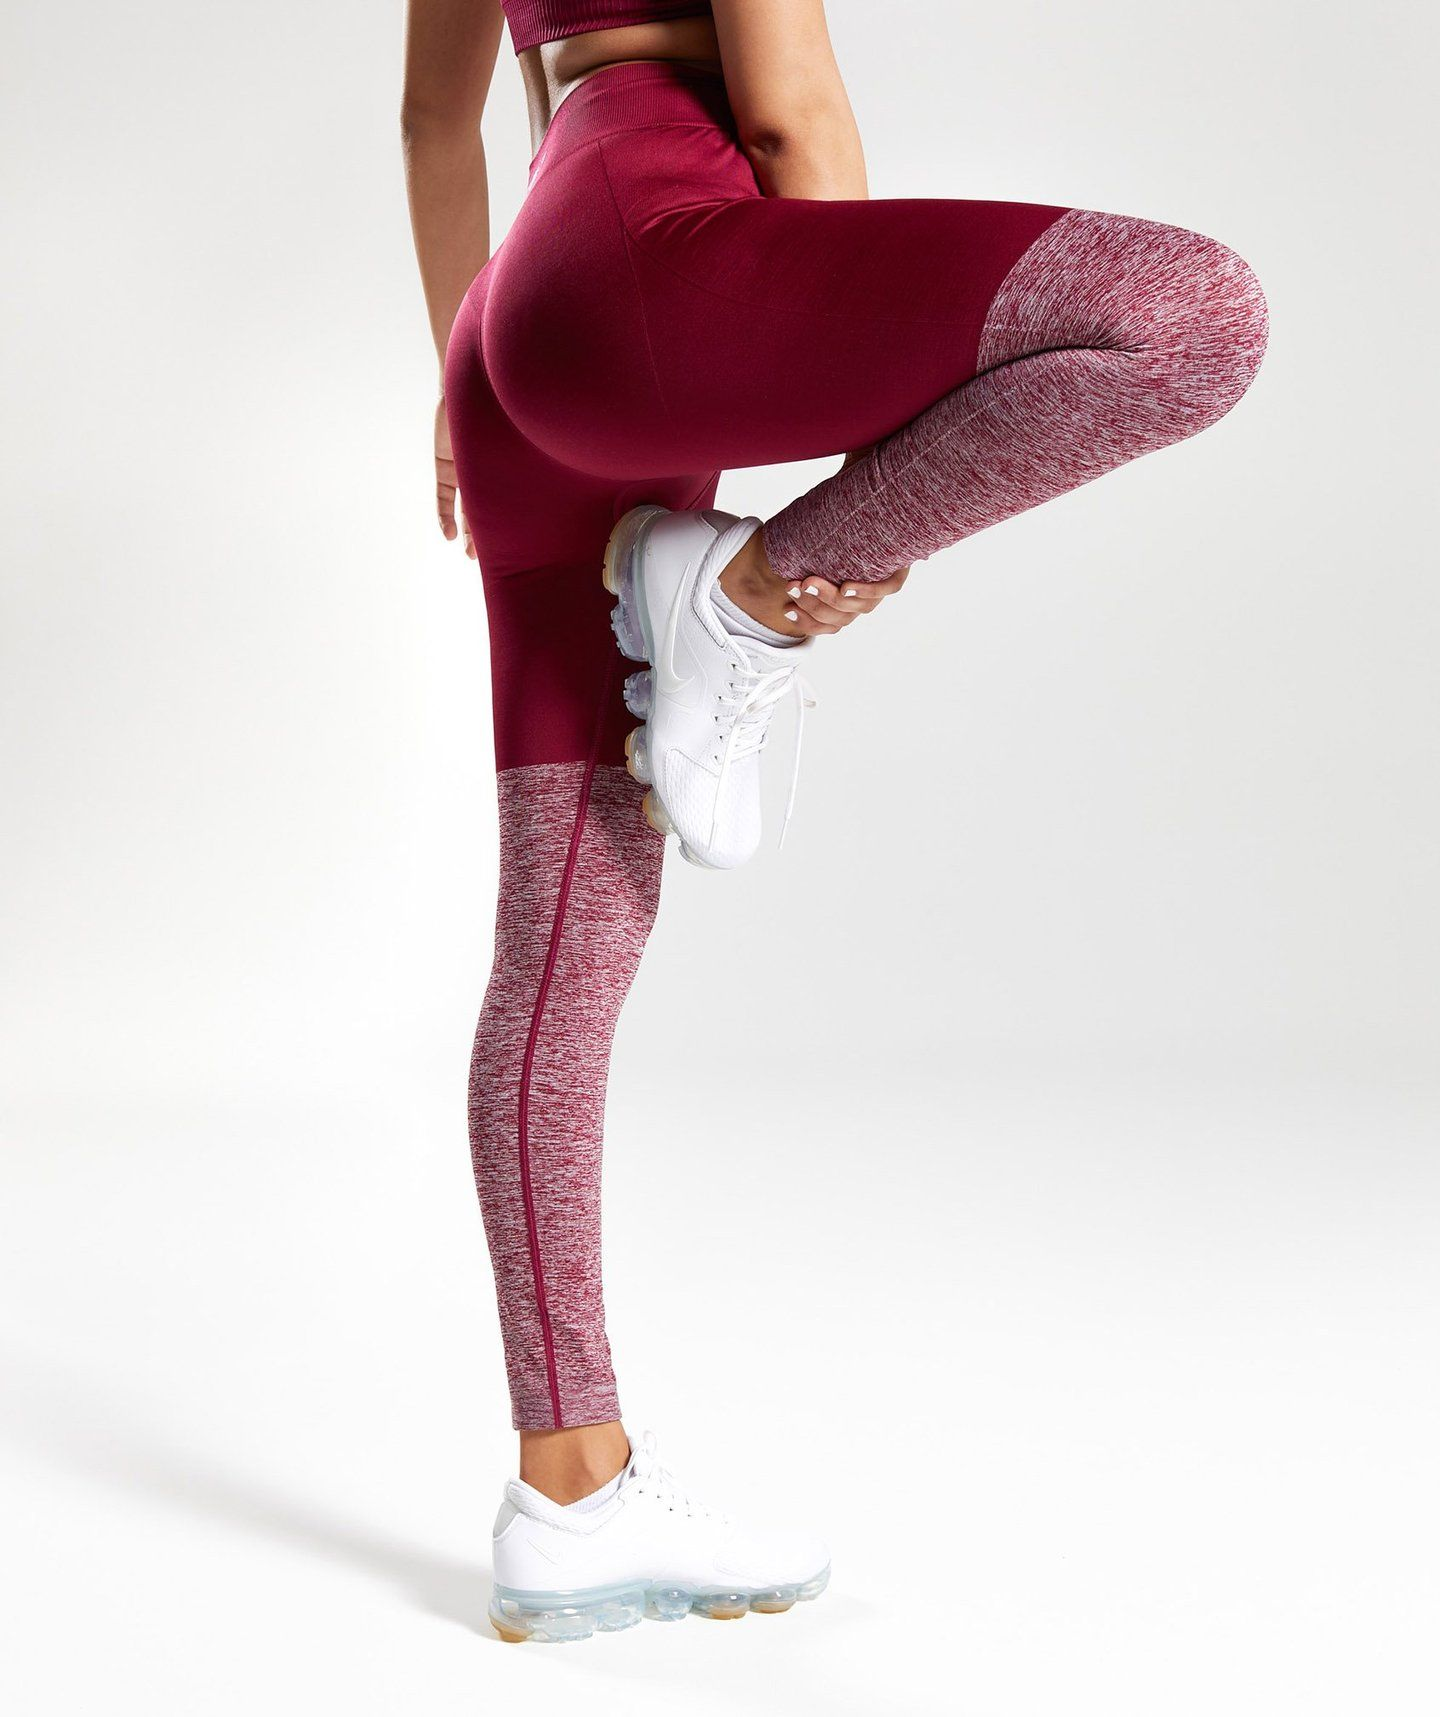 9d756914ac Gymshark TwoTone Seamless Leggings - Beet Beet Marl 4